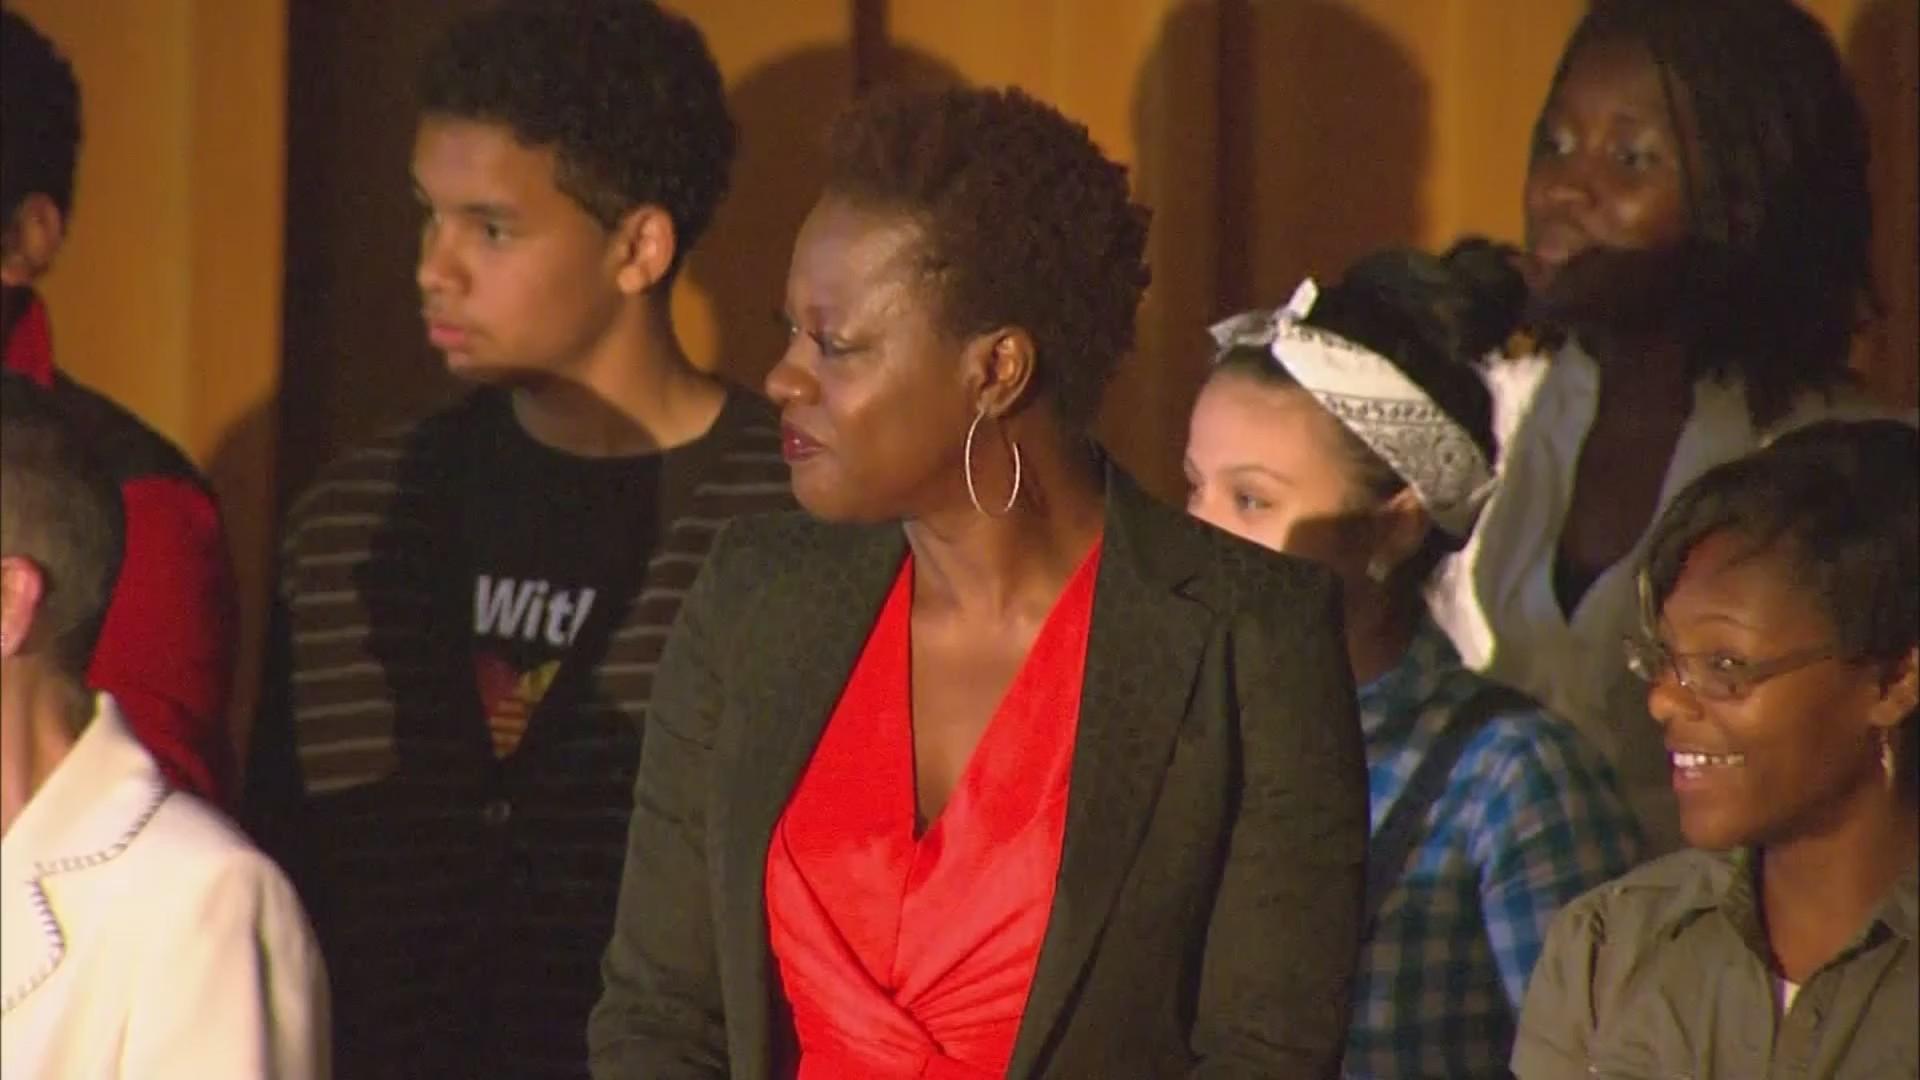 VIDEO: Viola Davis inspires students in her hometown of Central Falls, Rhode Island